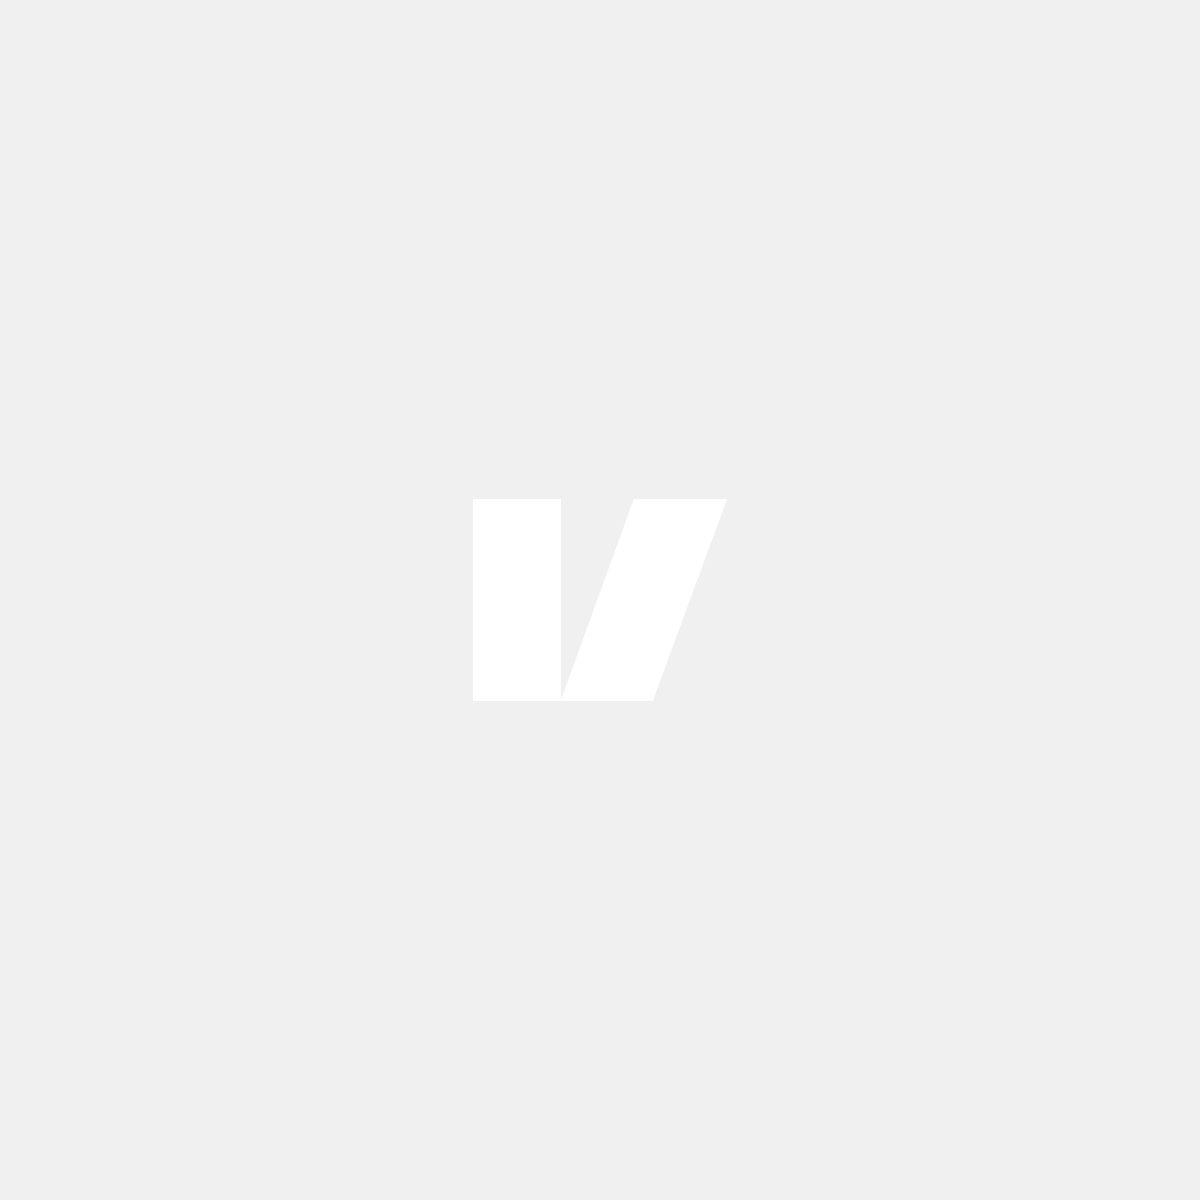 Iridium vinge till Volvo V70, XC70 00-07, kolfiber